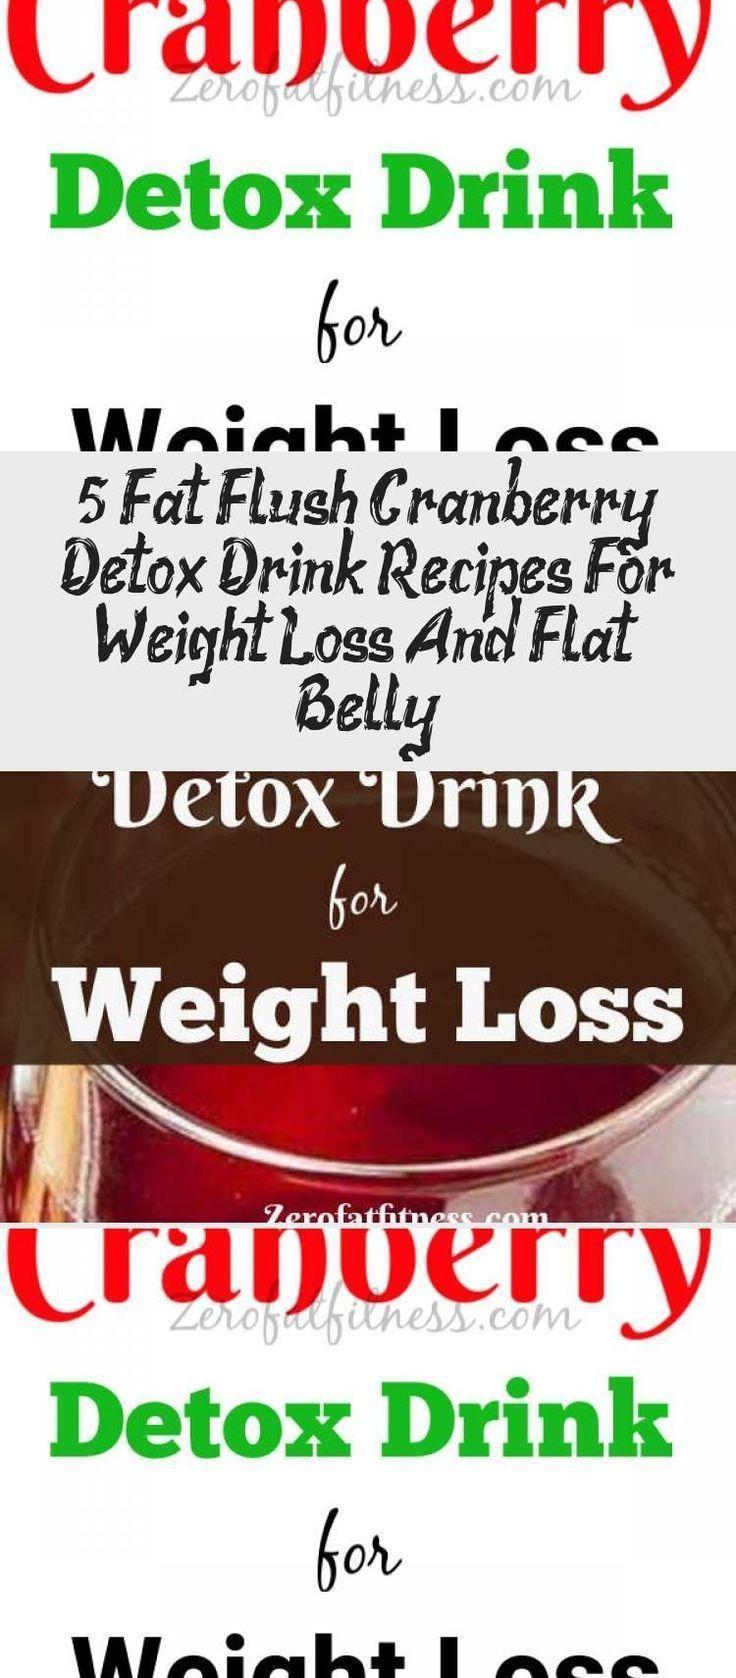 Wine Cranberry Juice Acv And Cranberry Juice Crown And Cranberry Juice Cran In 2020 Cranberry Juice Benefits Cranberry Detox Detox Drinks Recipes